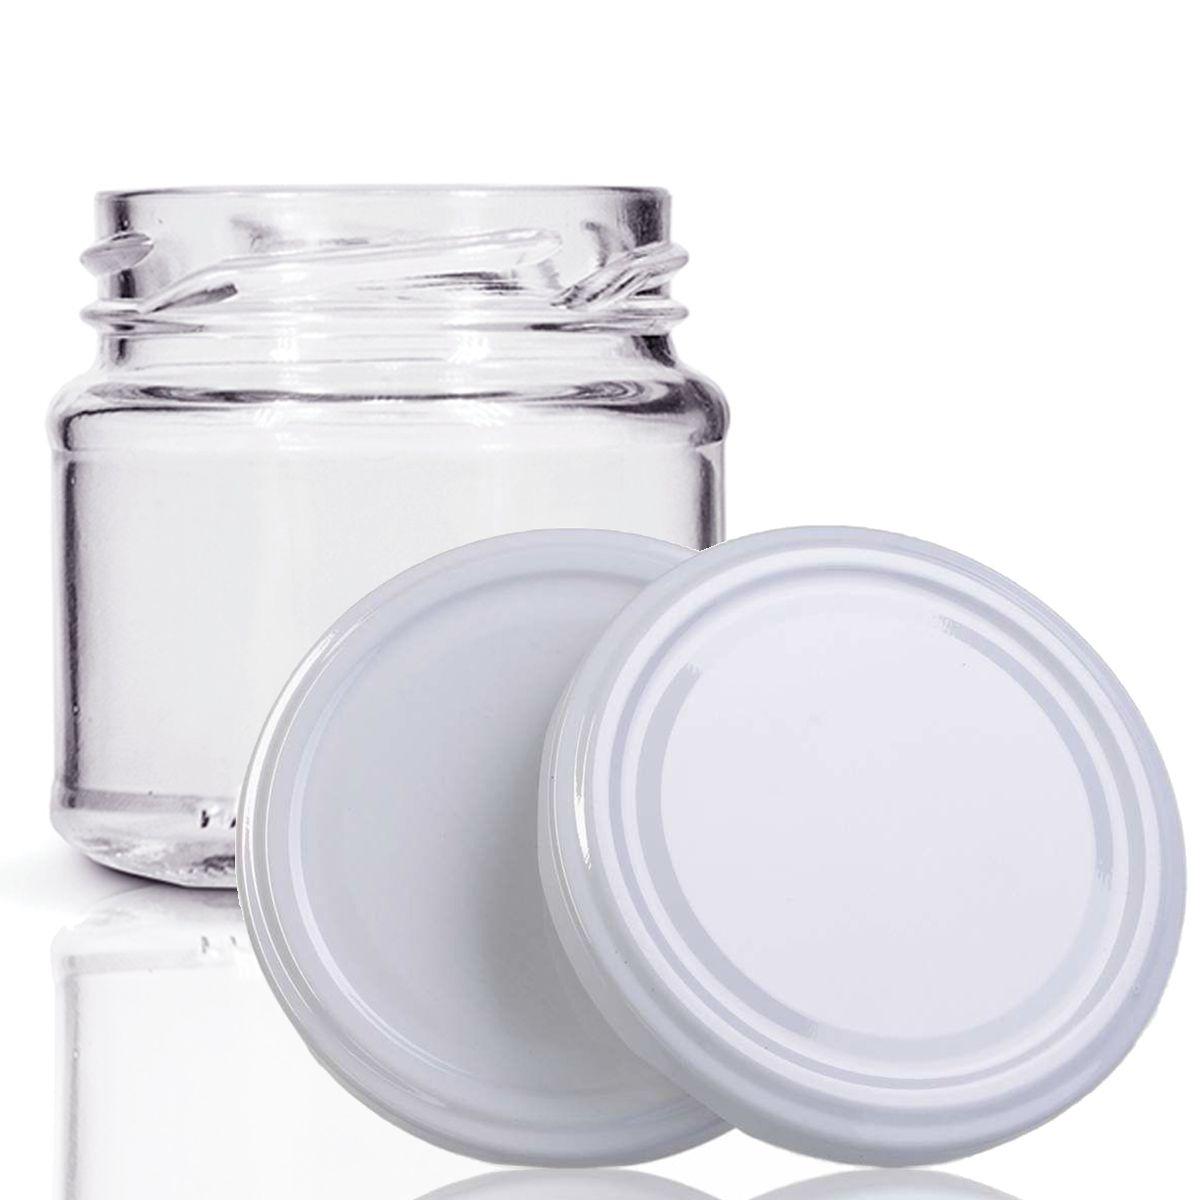 24 Potes De Vidro Mini Belém 150 Ml Tampa Branca + Lacre  - EMPÓRIO PACK